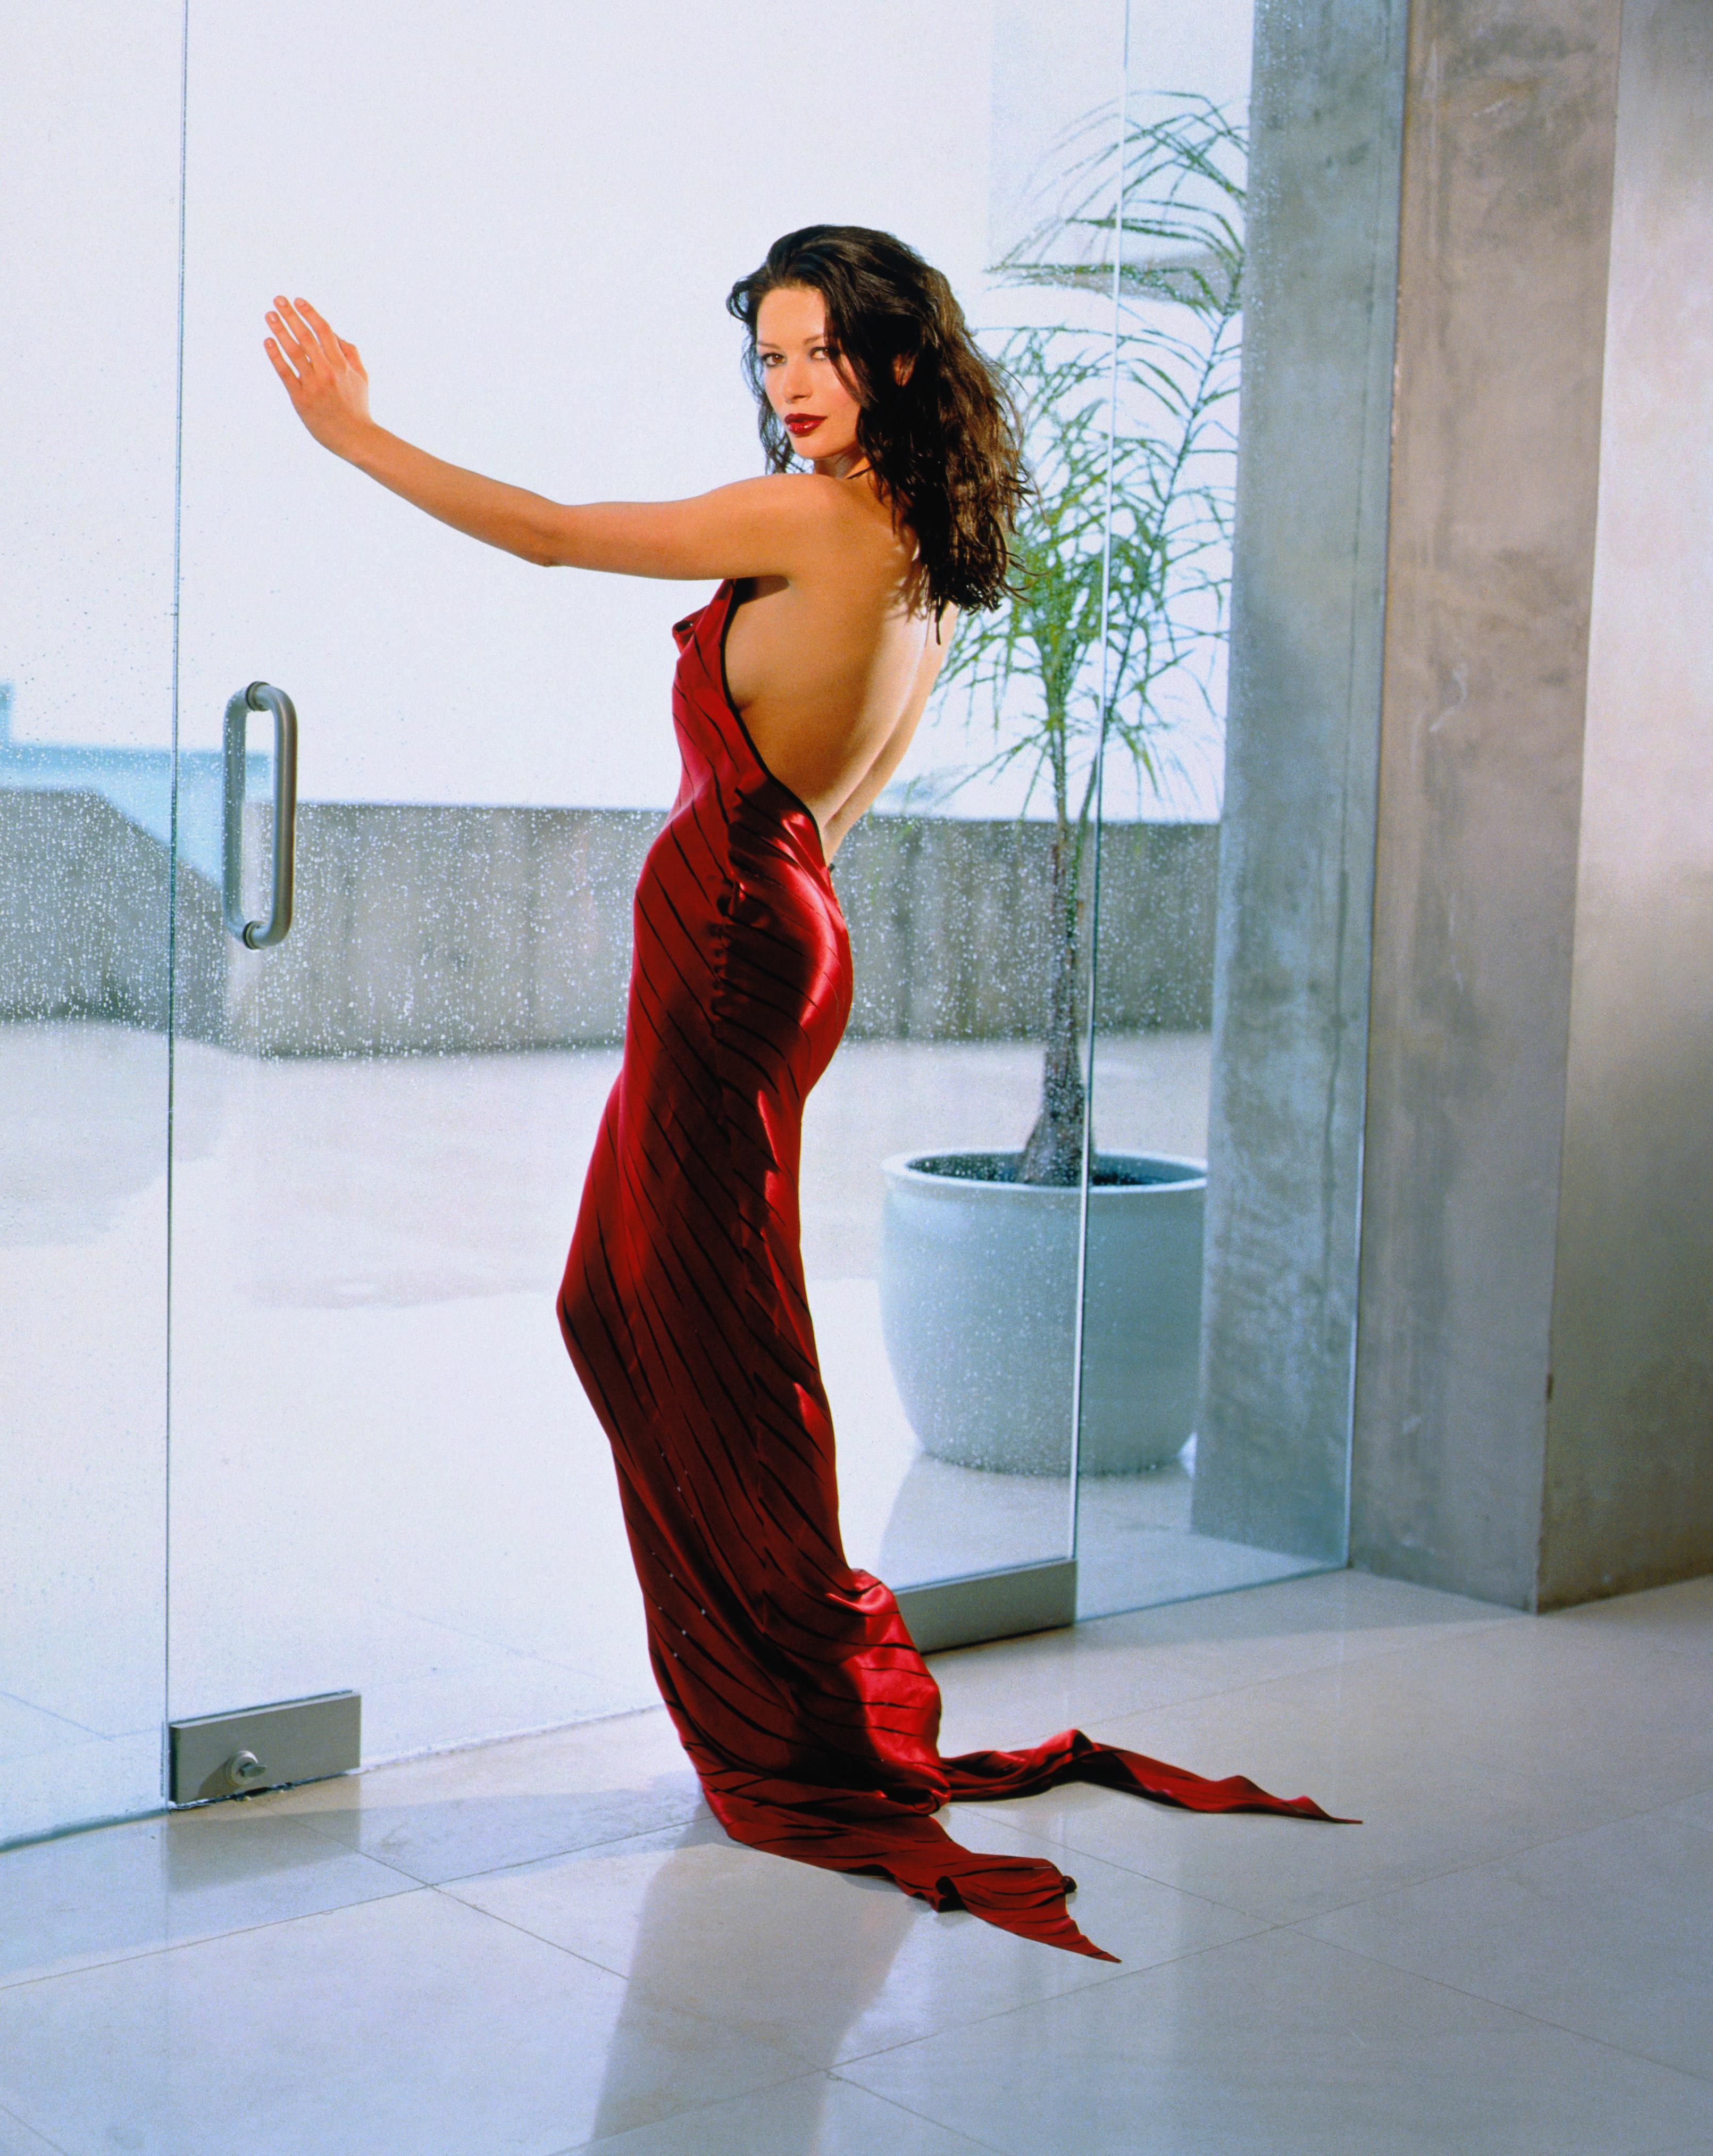 Actress Catherine Zeta-Jones